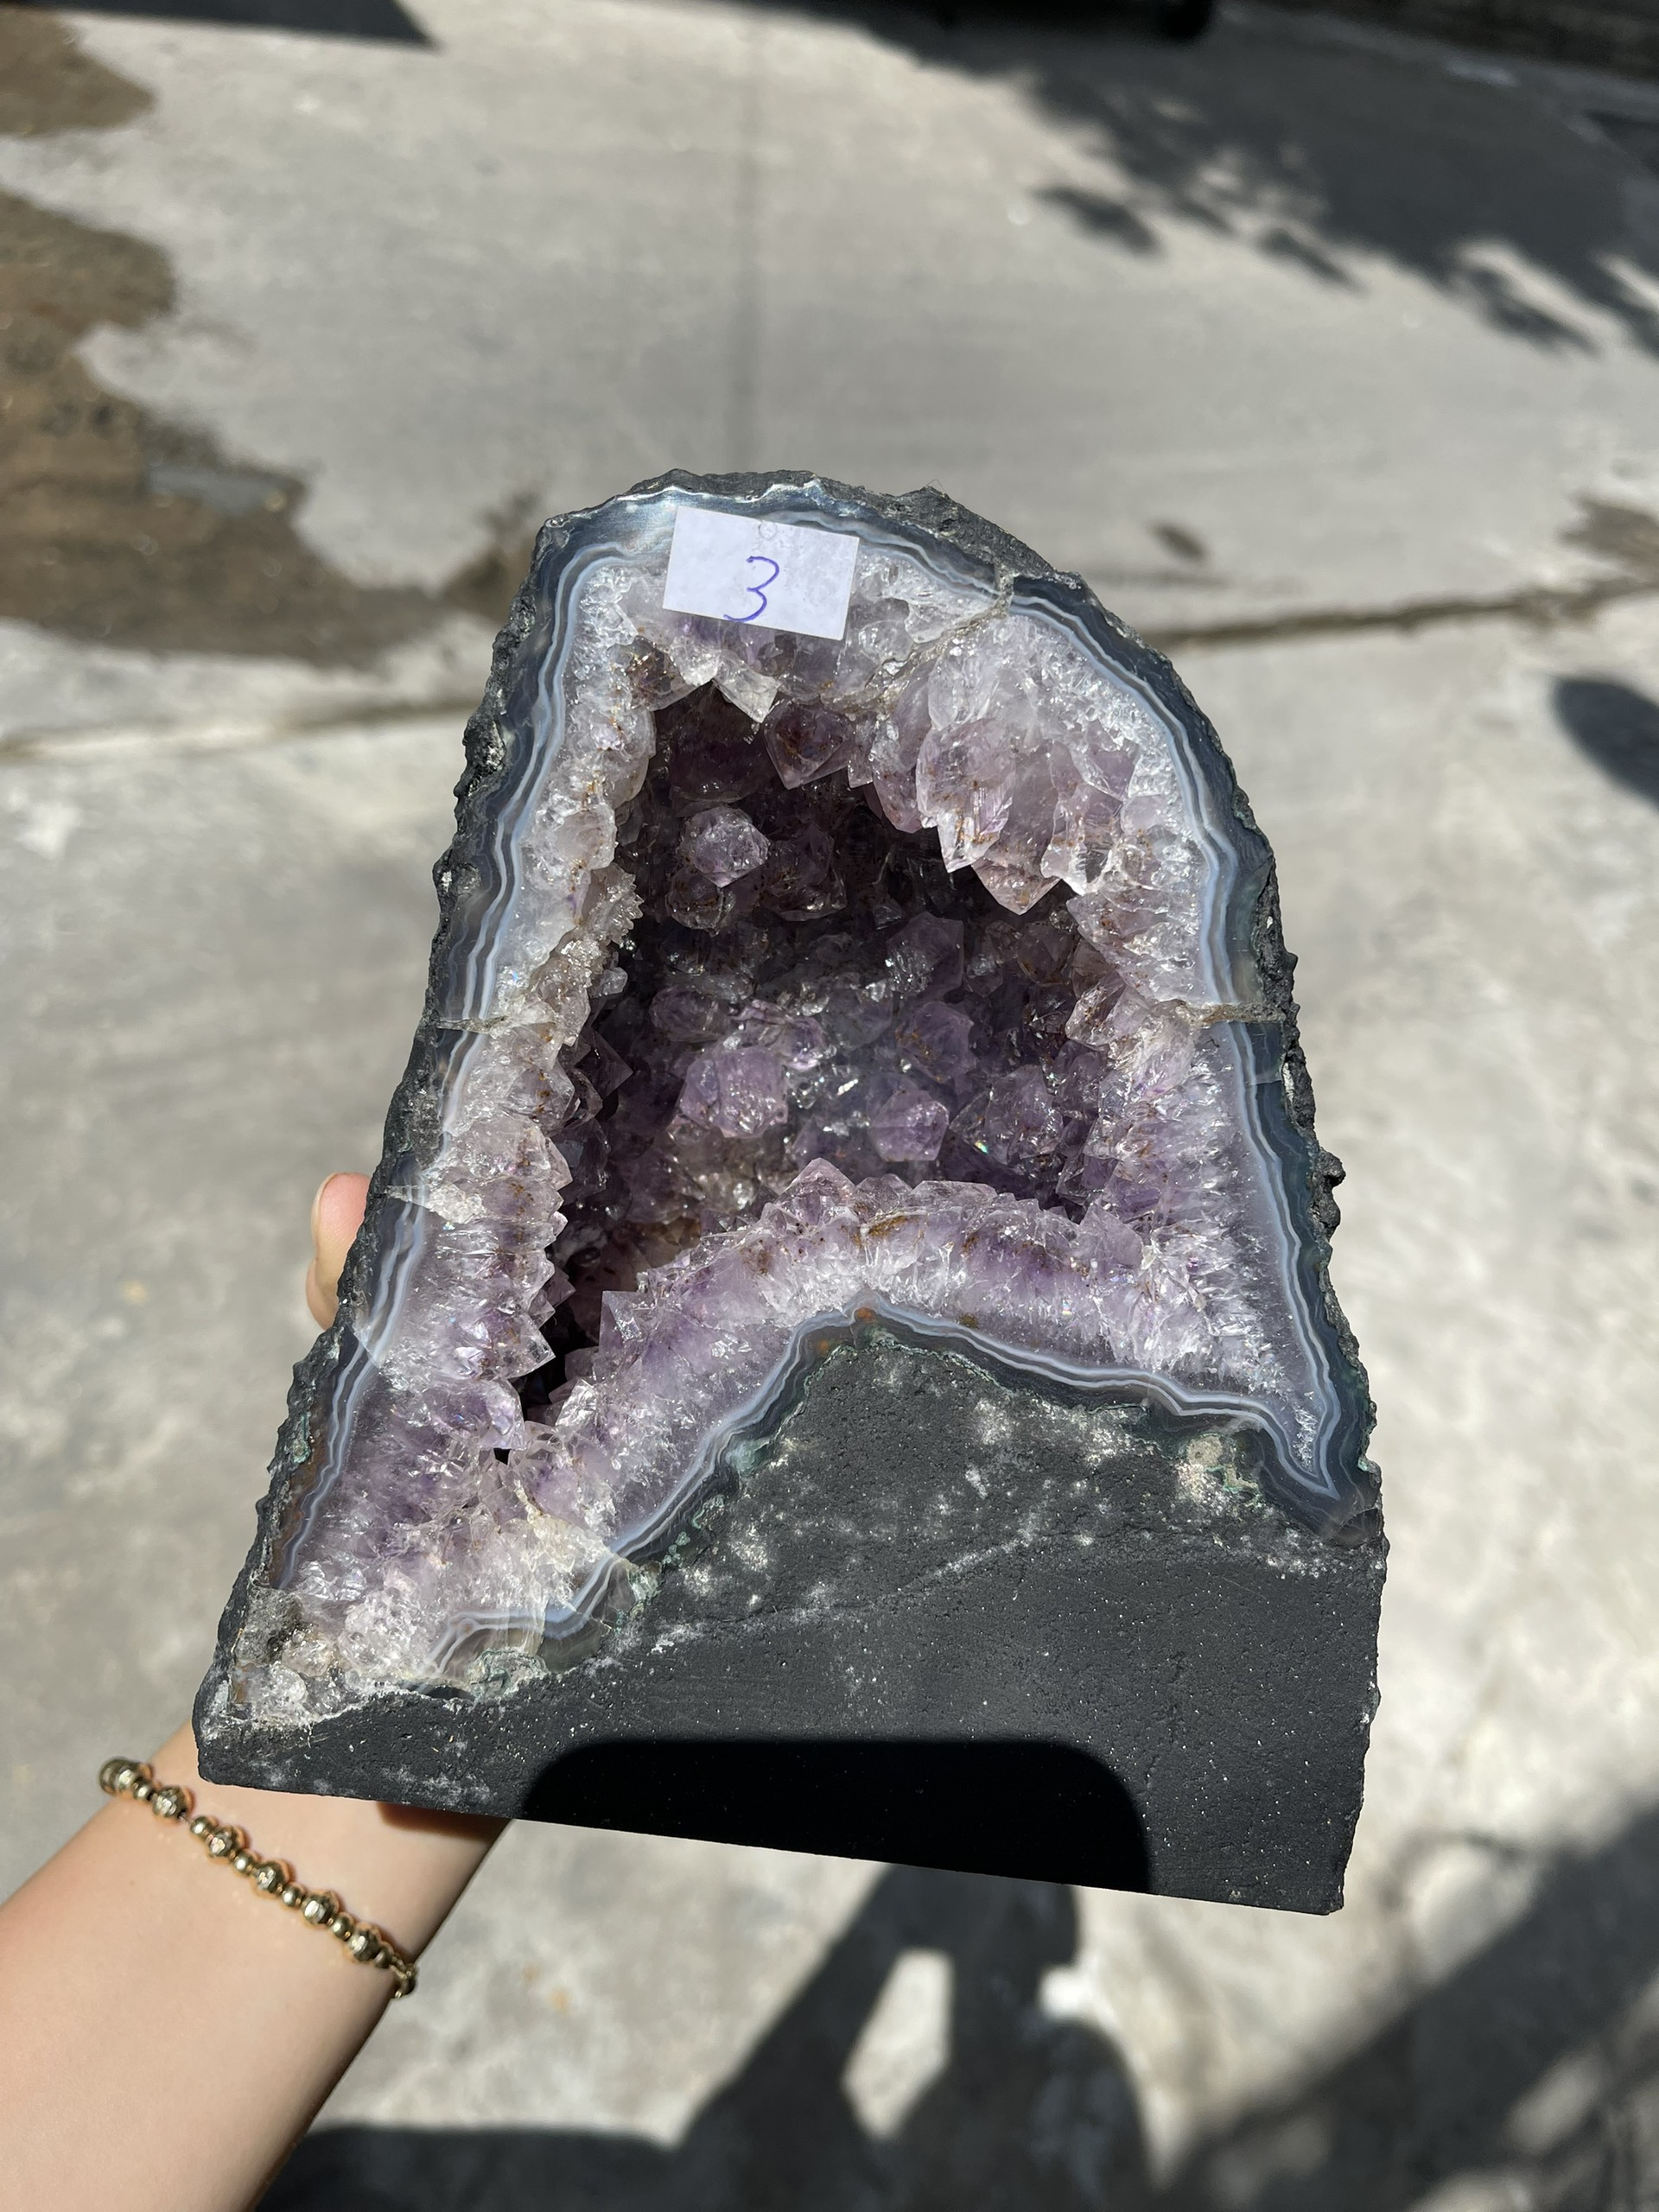 Hốc thạch anh tím - Amethyst Geode - KT : 17 x 15cm, 3kg (T89)